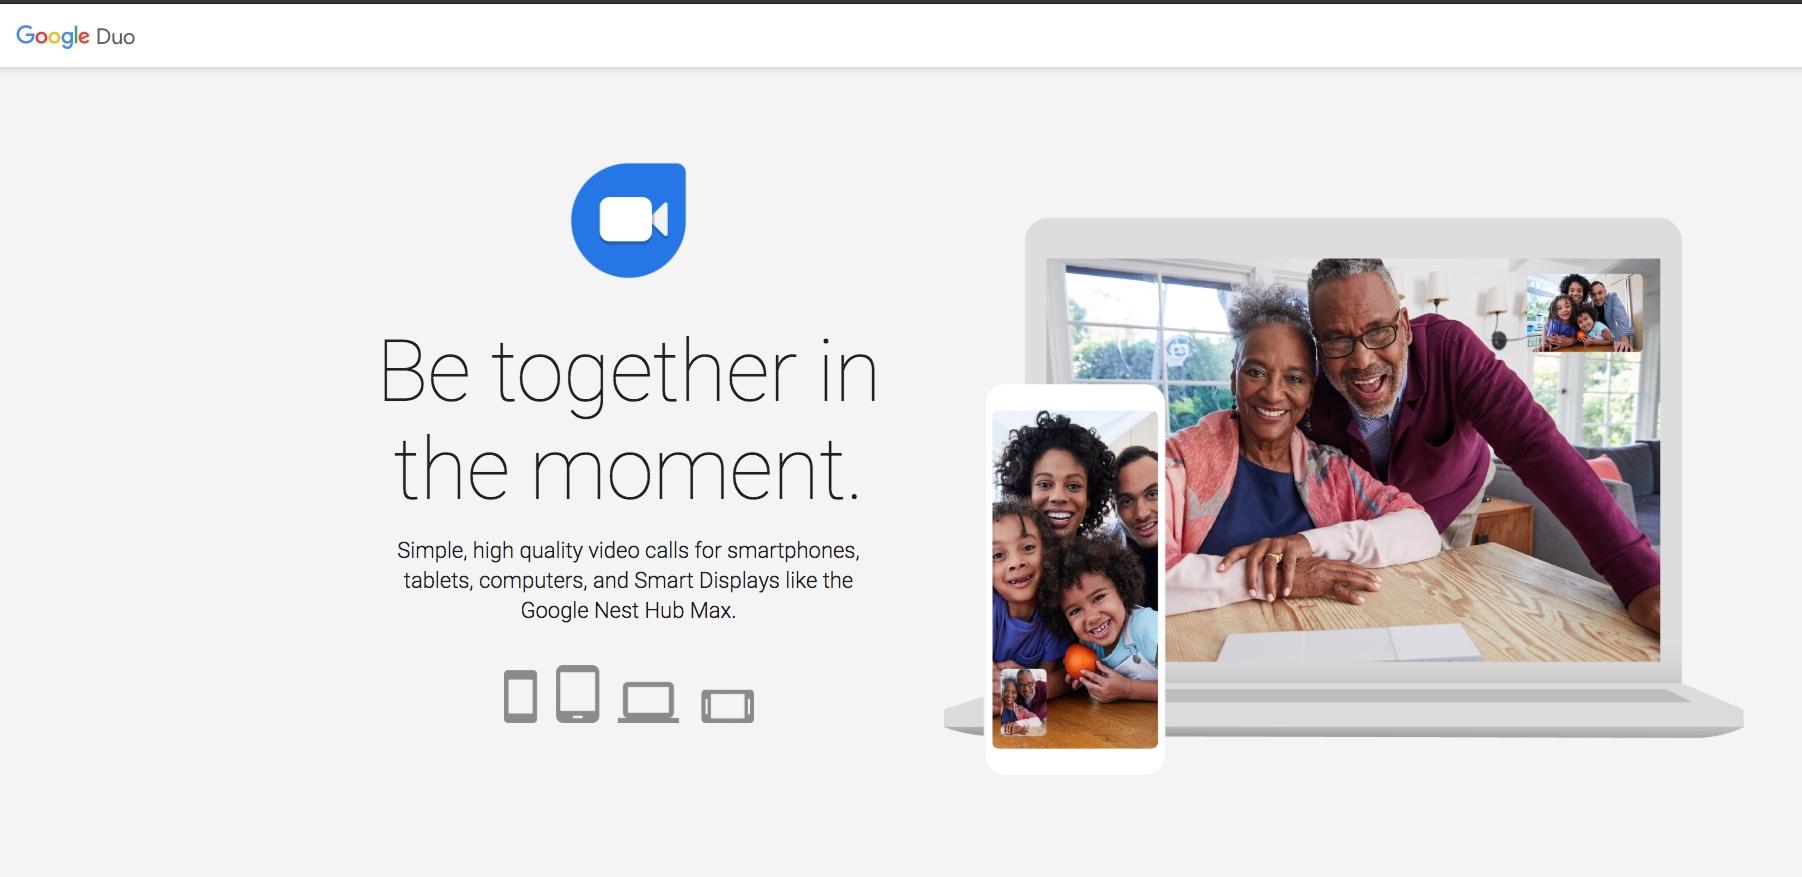 Google Duo - Customer Service engagement